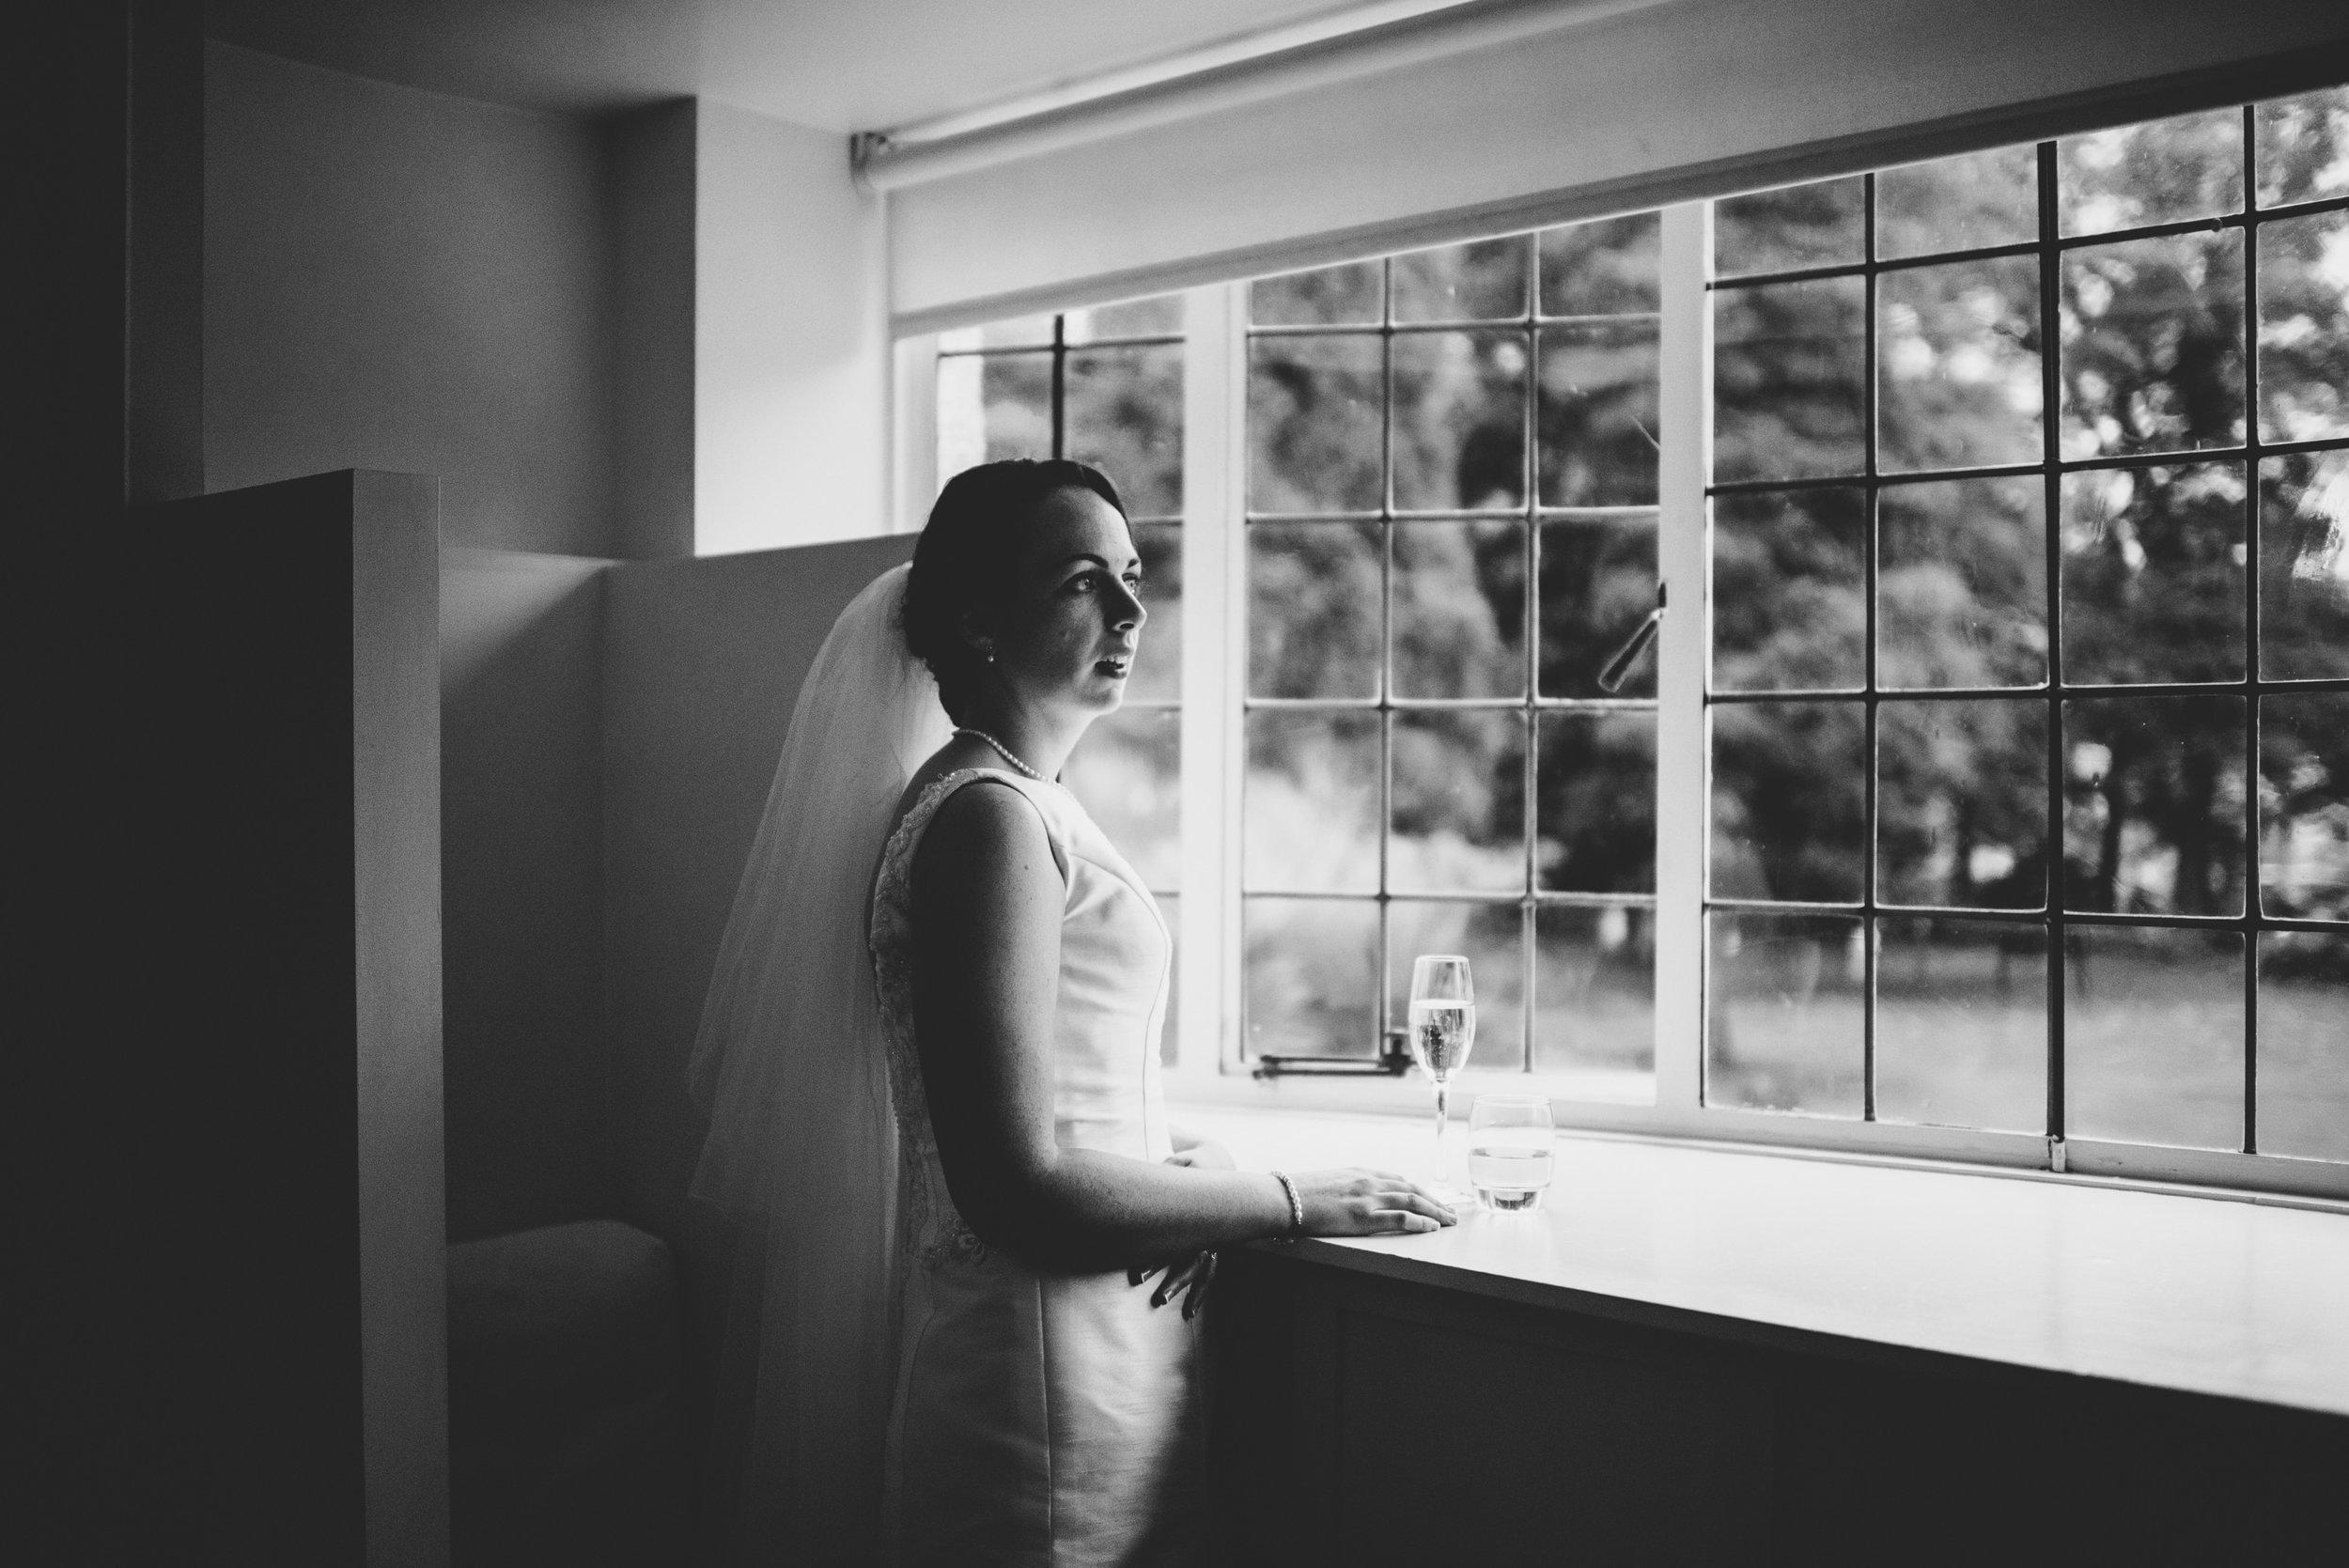 0225-LISA-DEVINE-PHOTOGRAPHY-ALTERNATIVE-WEDDING-PHOTOGRAPHY-SCOTLAND-DESTINATION-WEDDINGS-GLASGOW-WEDDINGS-COOL-WEDDINGS-STYLISH-WEDDINGS.JPG